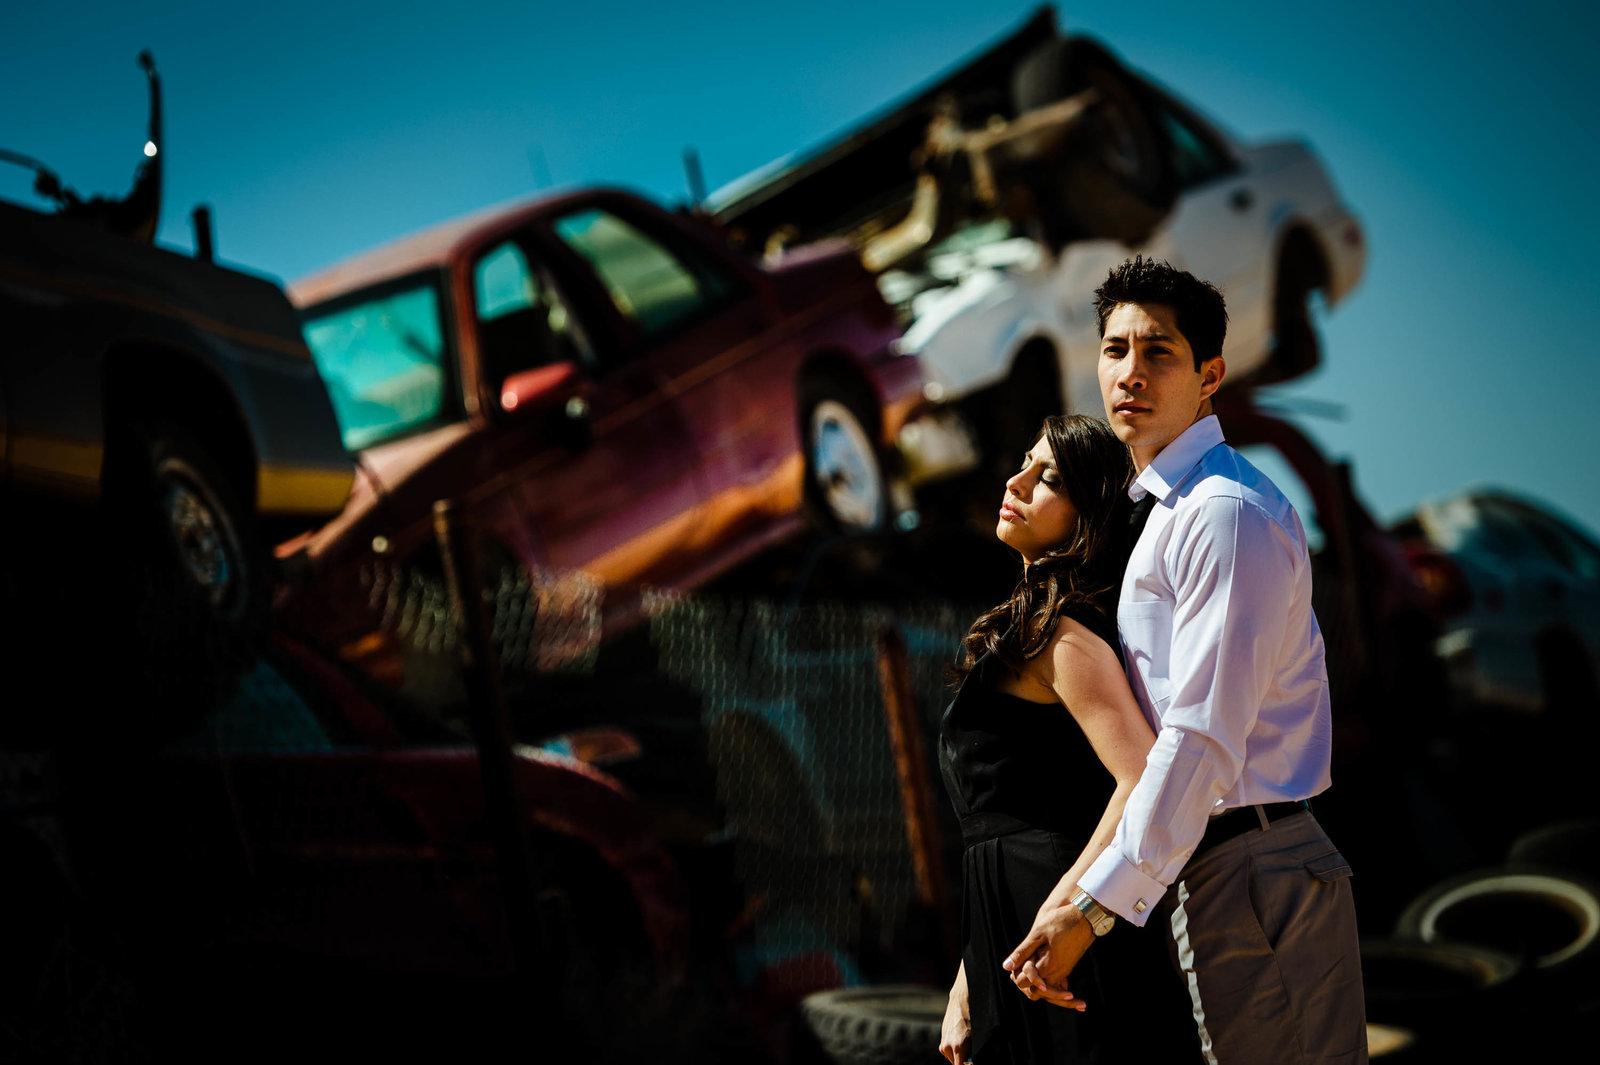 033-El-paso-wedding-photographer-El Paso Wedding Photographer_E52